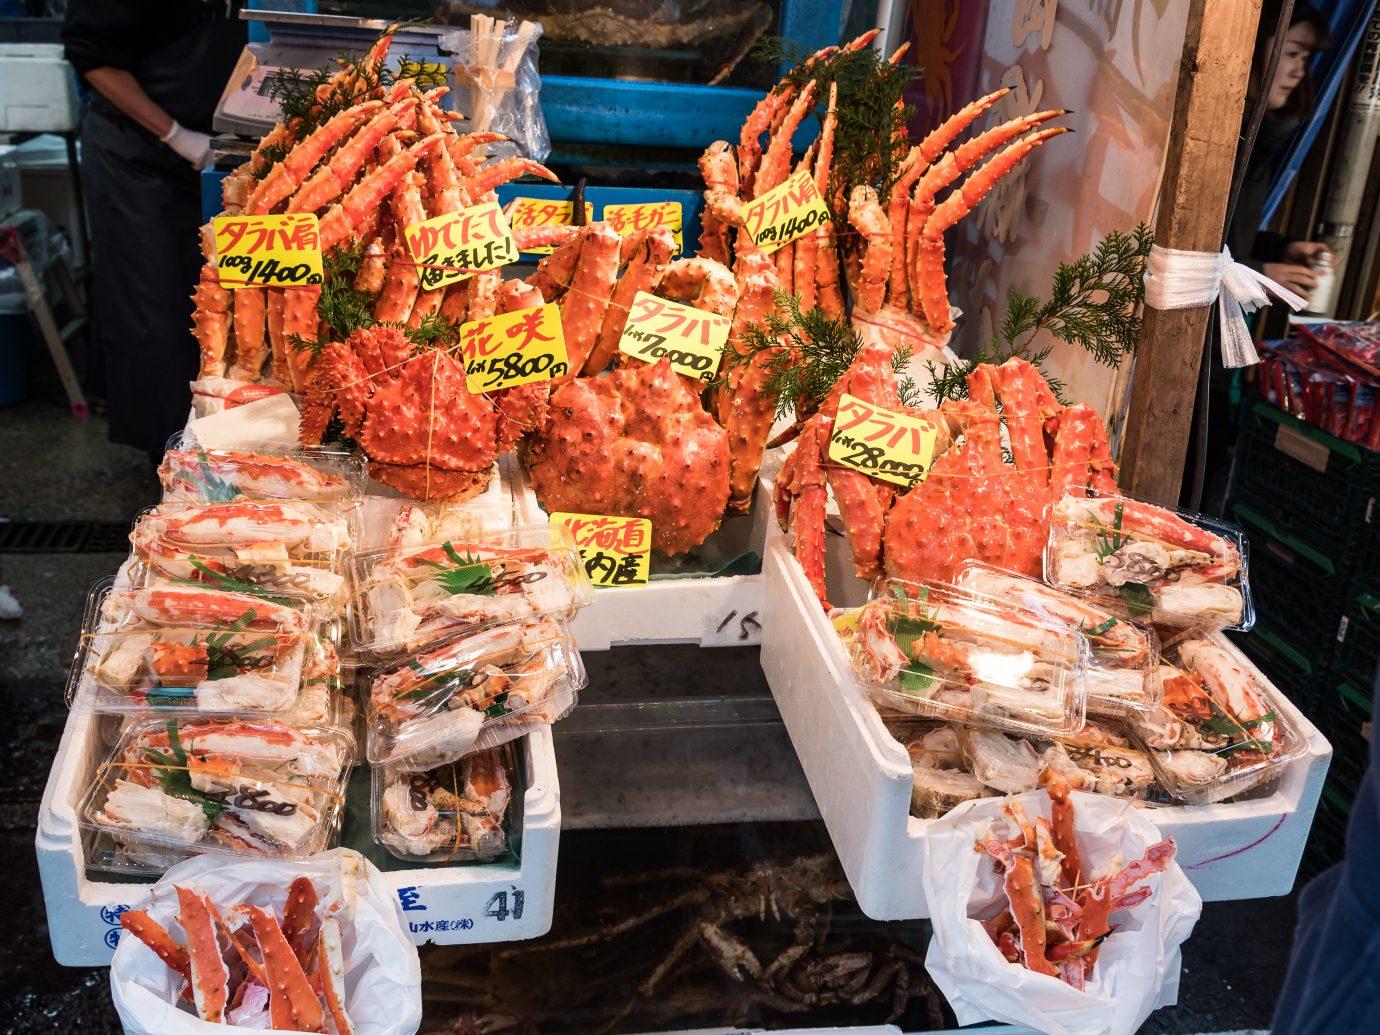 Crabs for sale at the Tsukiji fish market.